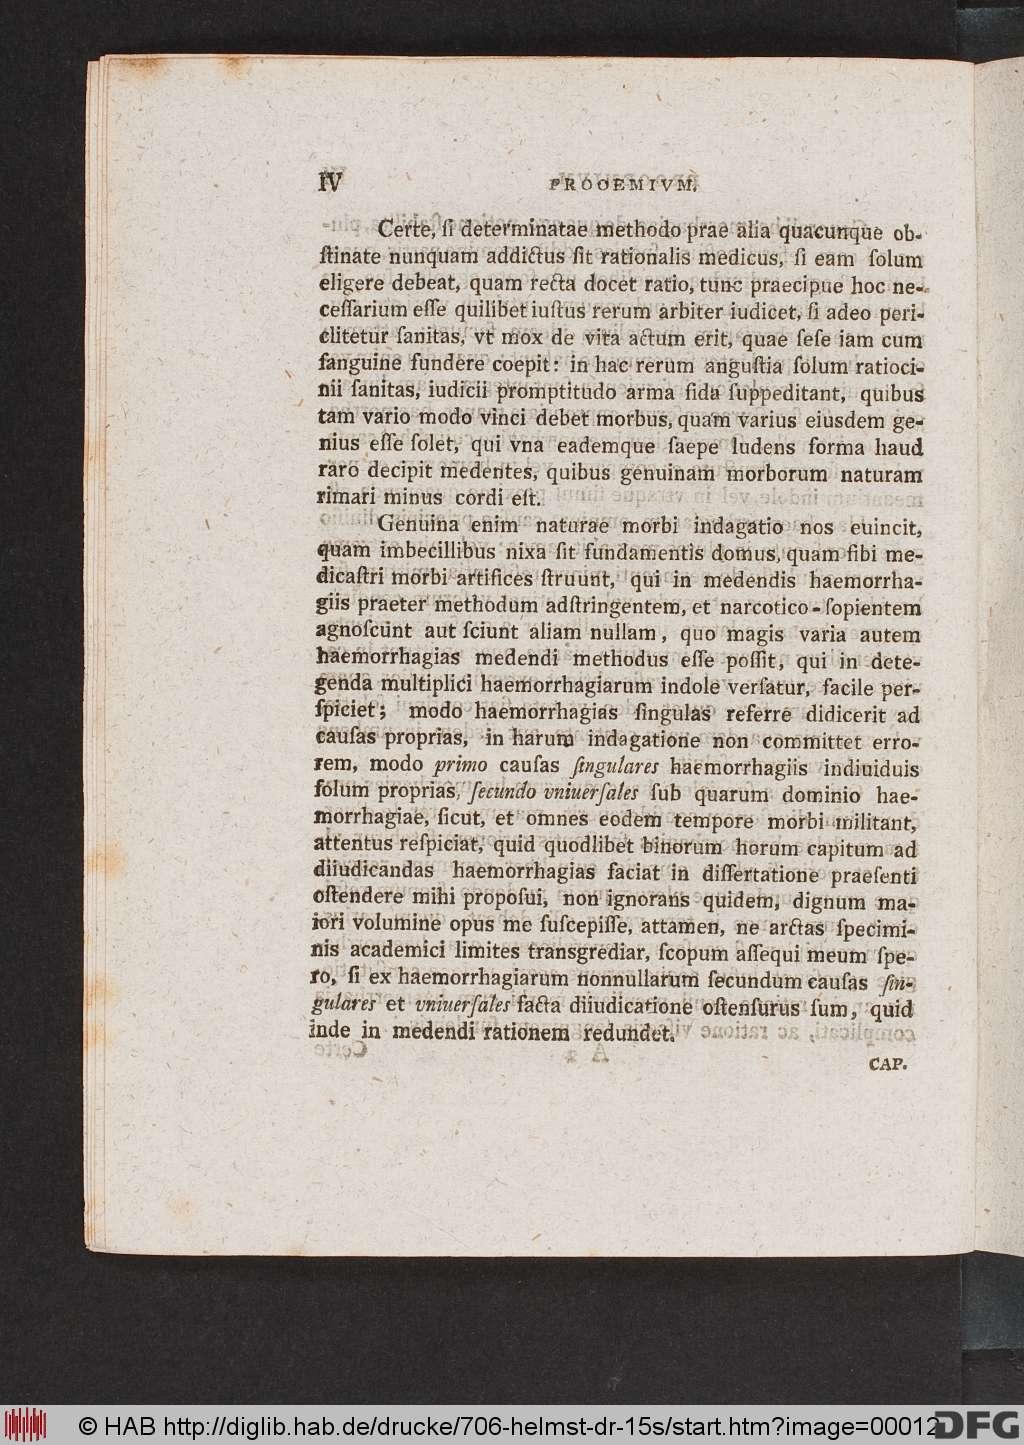 https://diglib.hab.de/drucke/706-helmst-dr-15s/00012.jpg